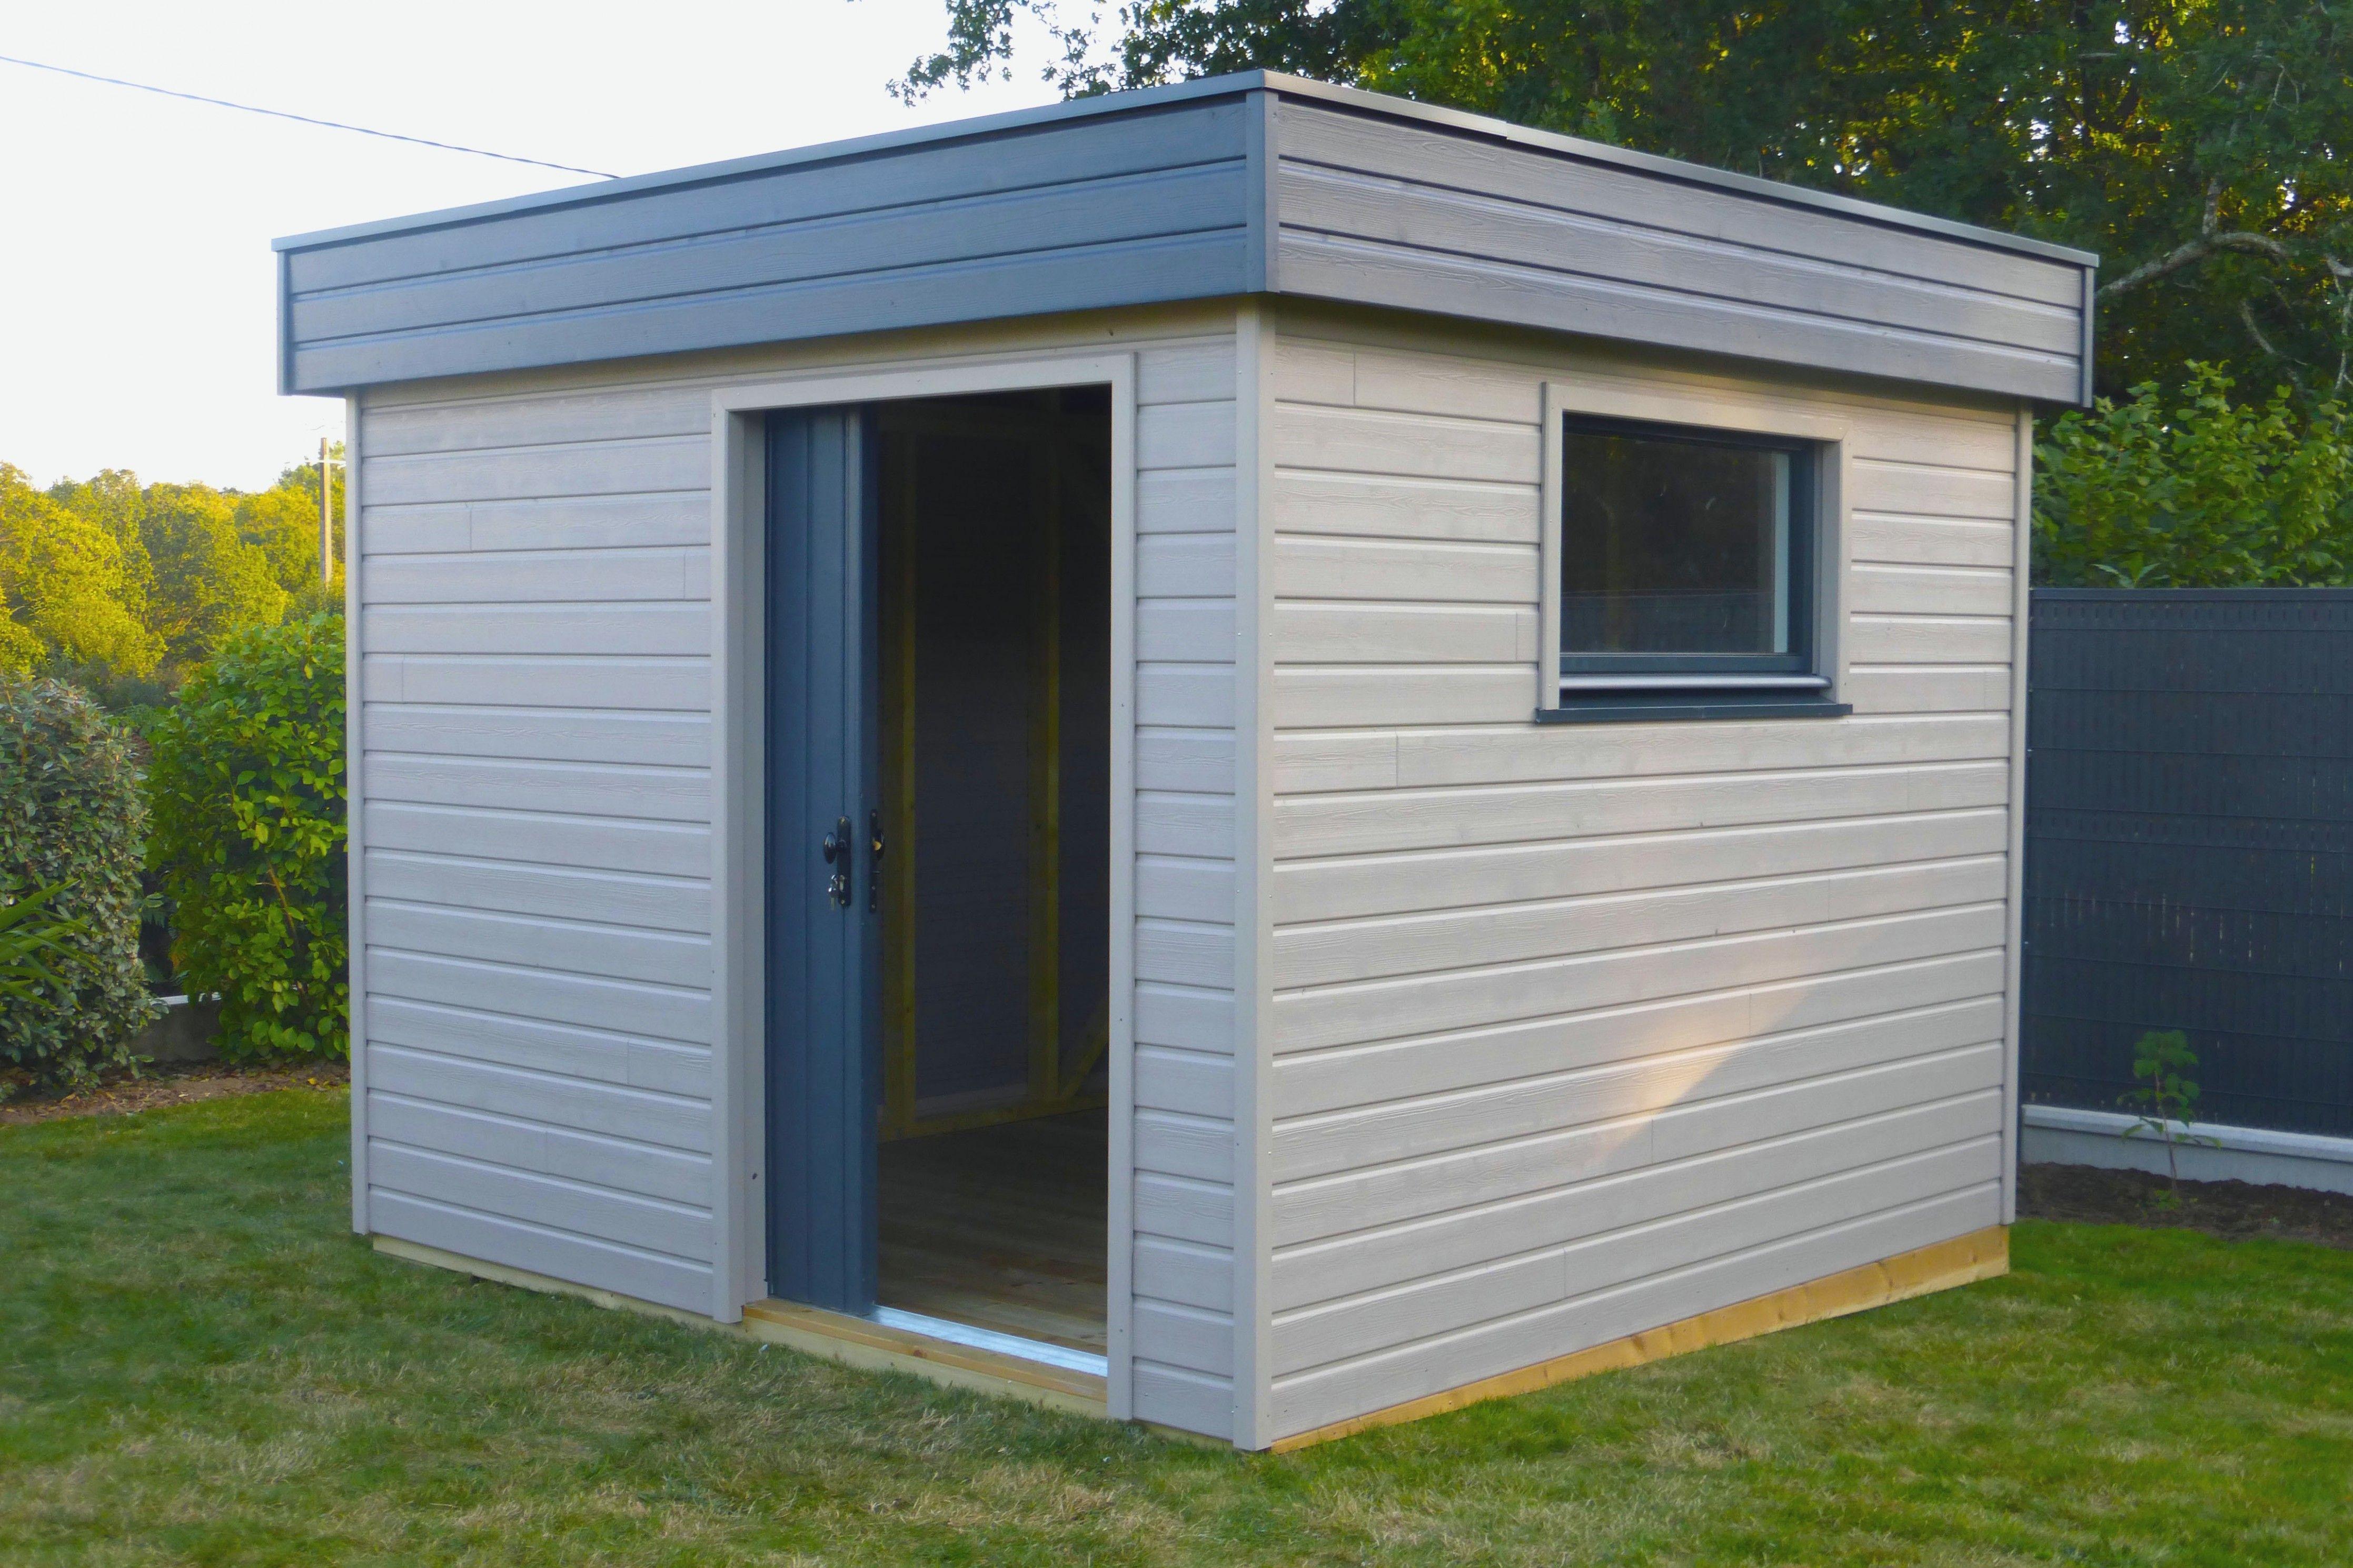 500 Principaux Risques De Participer A Abri De Jardin 500m500 Occasion Indoor Garden Outdoor Outdoor Structures